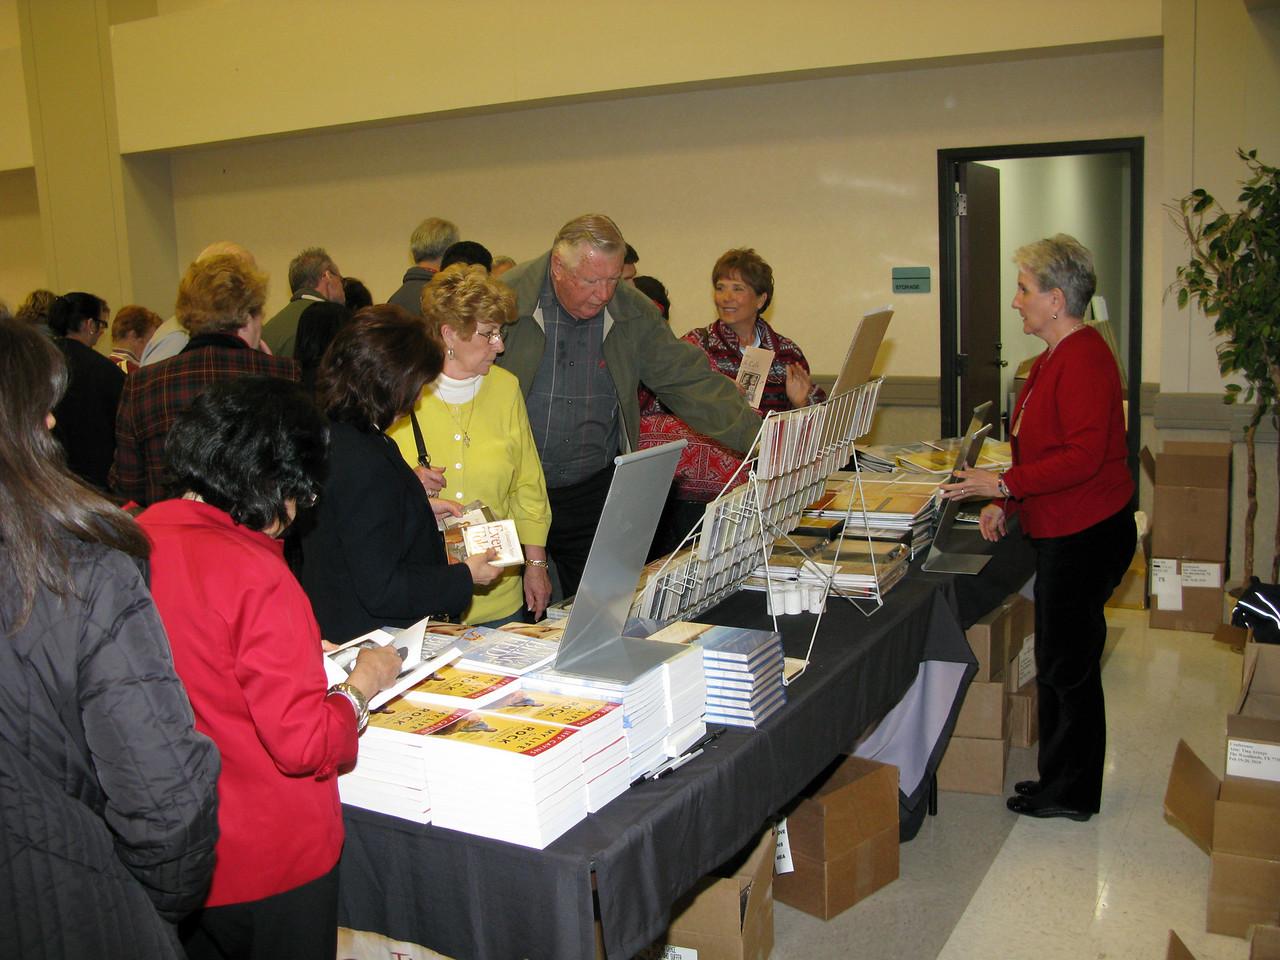 Woodlands, Texas, St  Anthony, Cavins - 079 - 2010-02-19